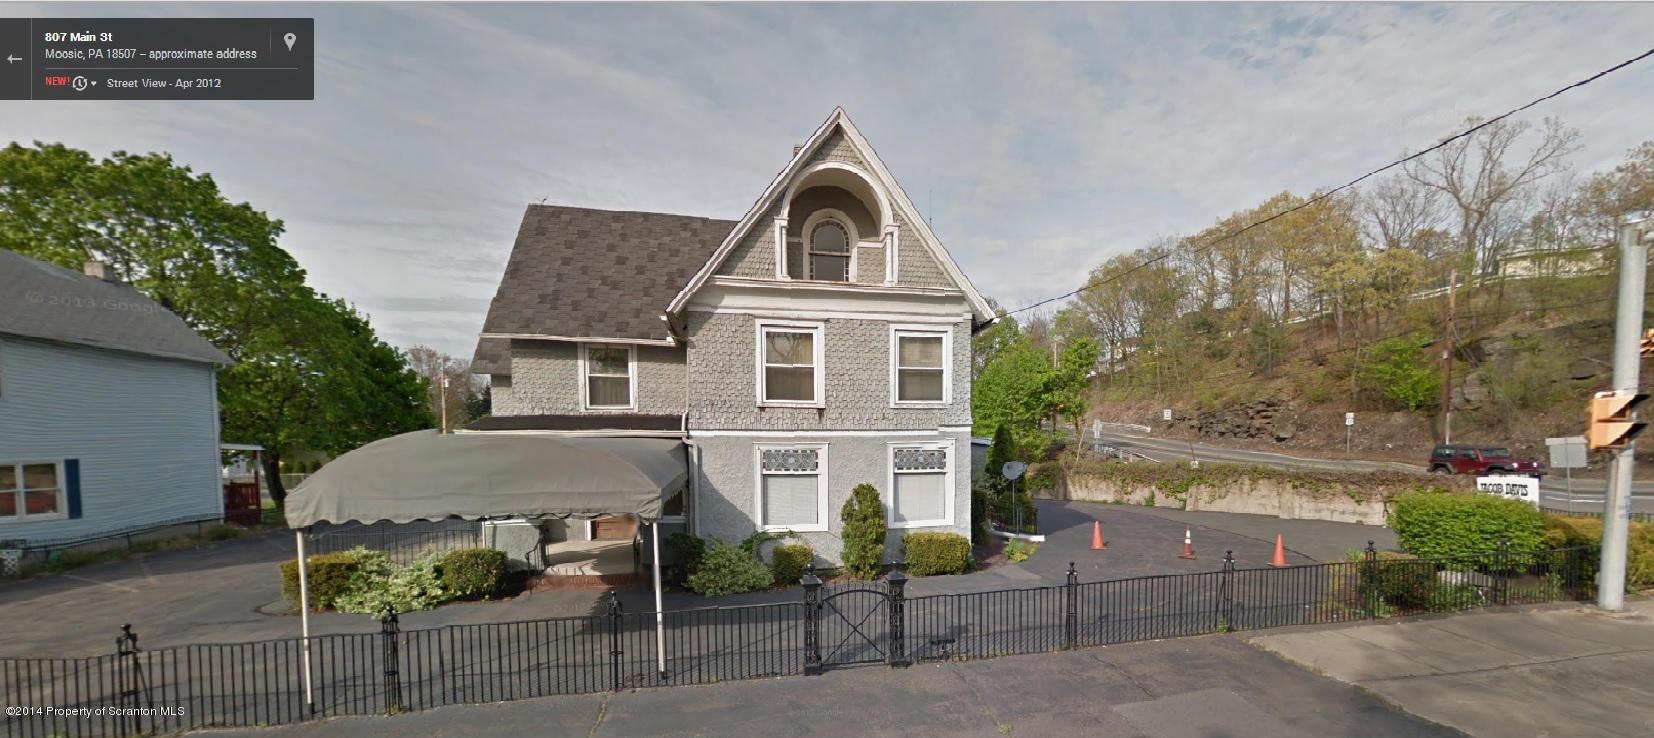 813 Main St, Moosic, Pennsylvania 18507, ,3 BathroomsBathrooms,Commercial,For Sale,Main,14-2093